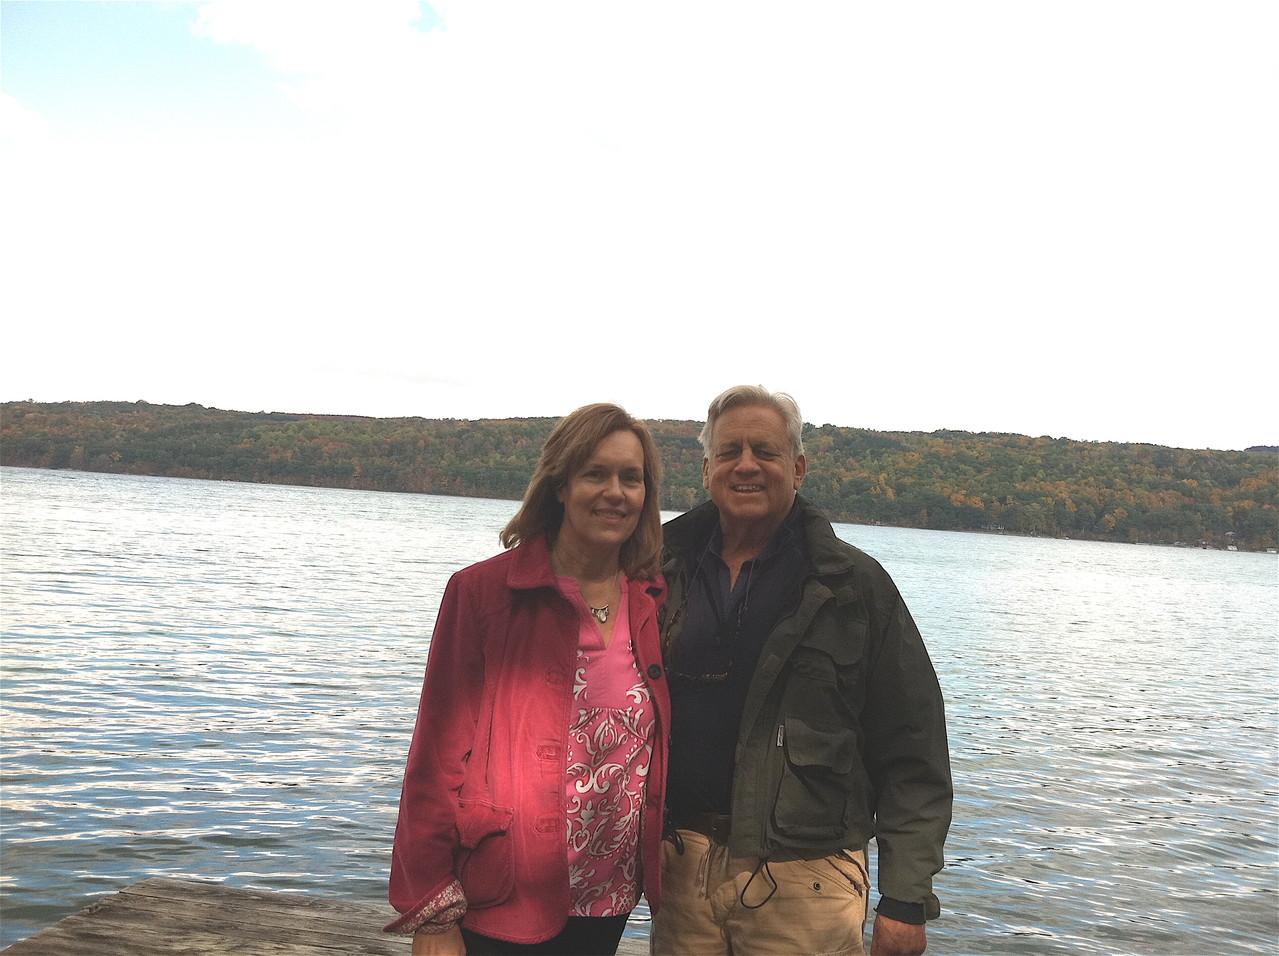 Lorraine & Stuart, Oct. 6, 2012 Skaneateles Lake